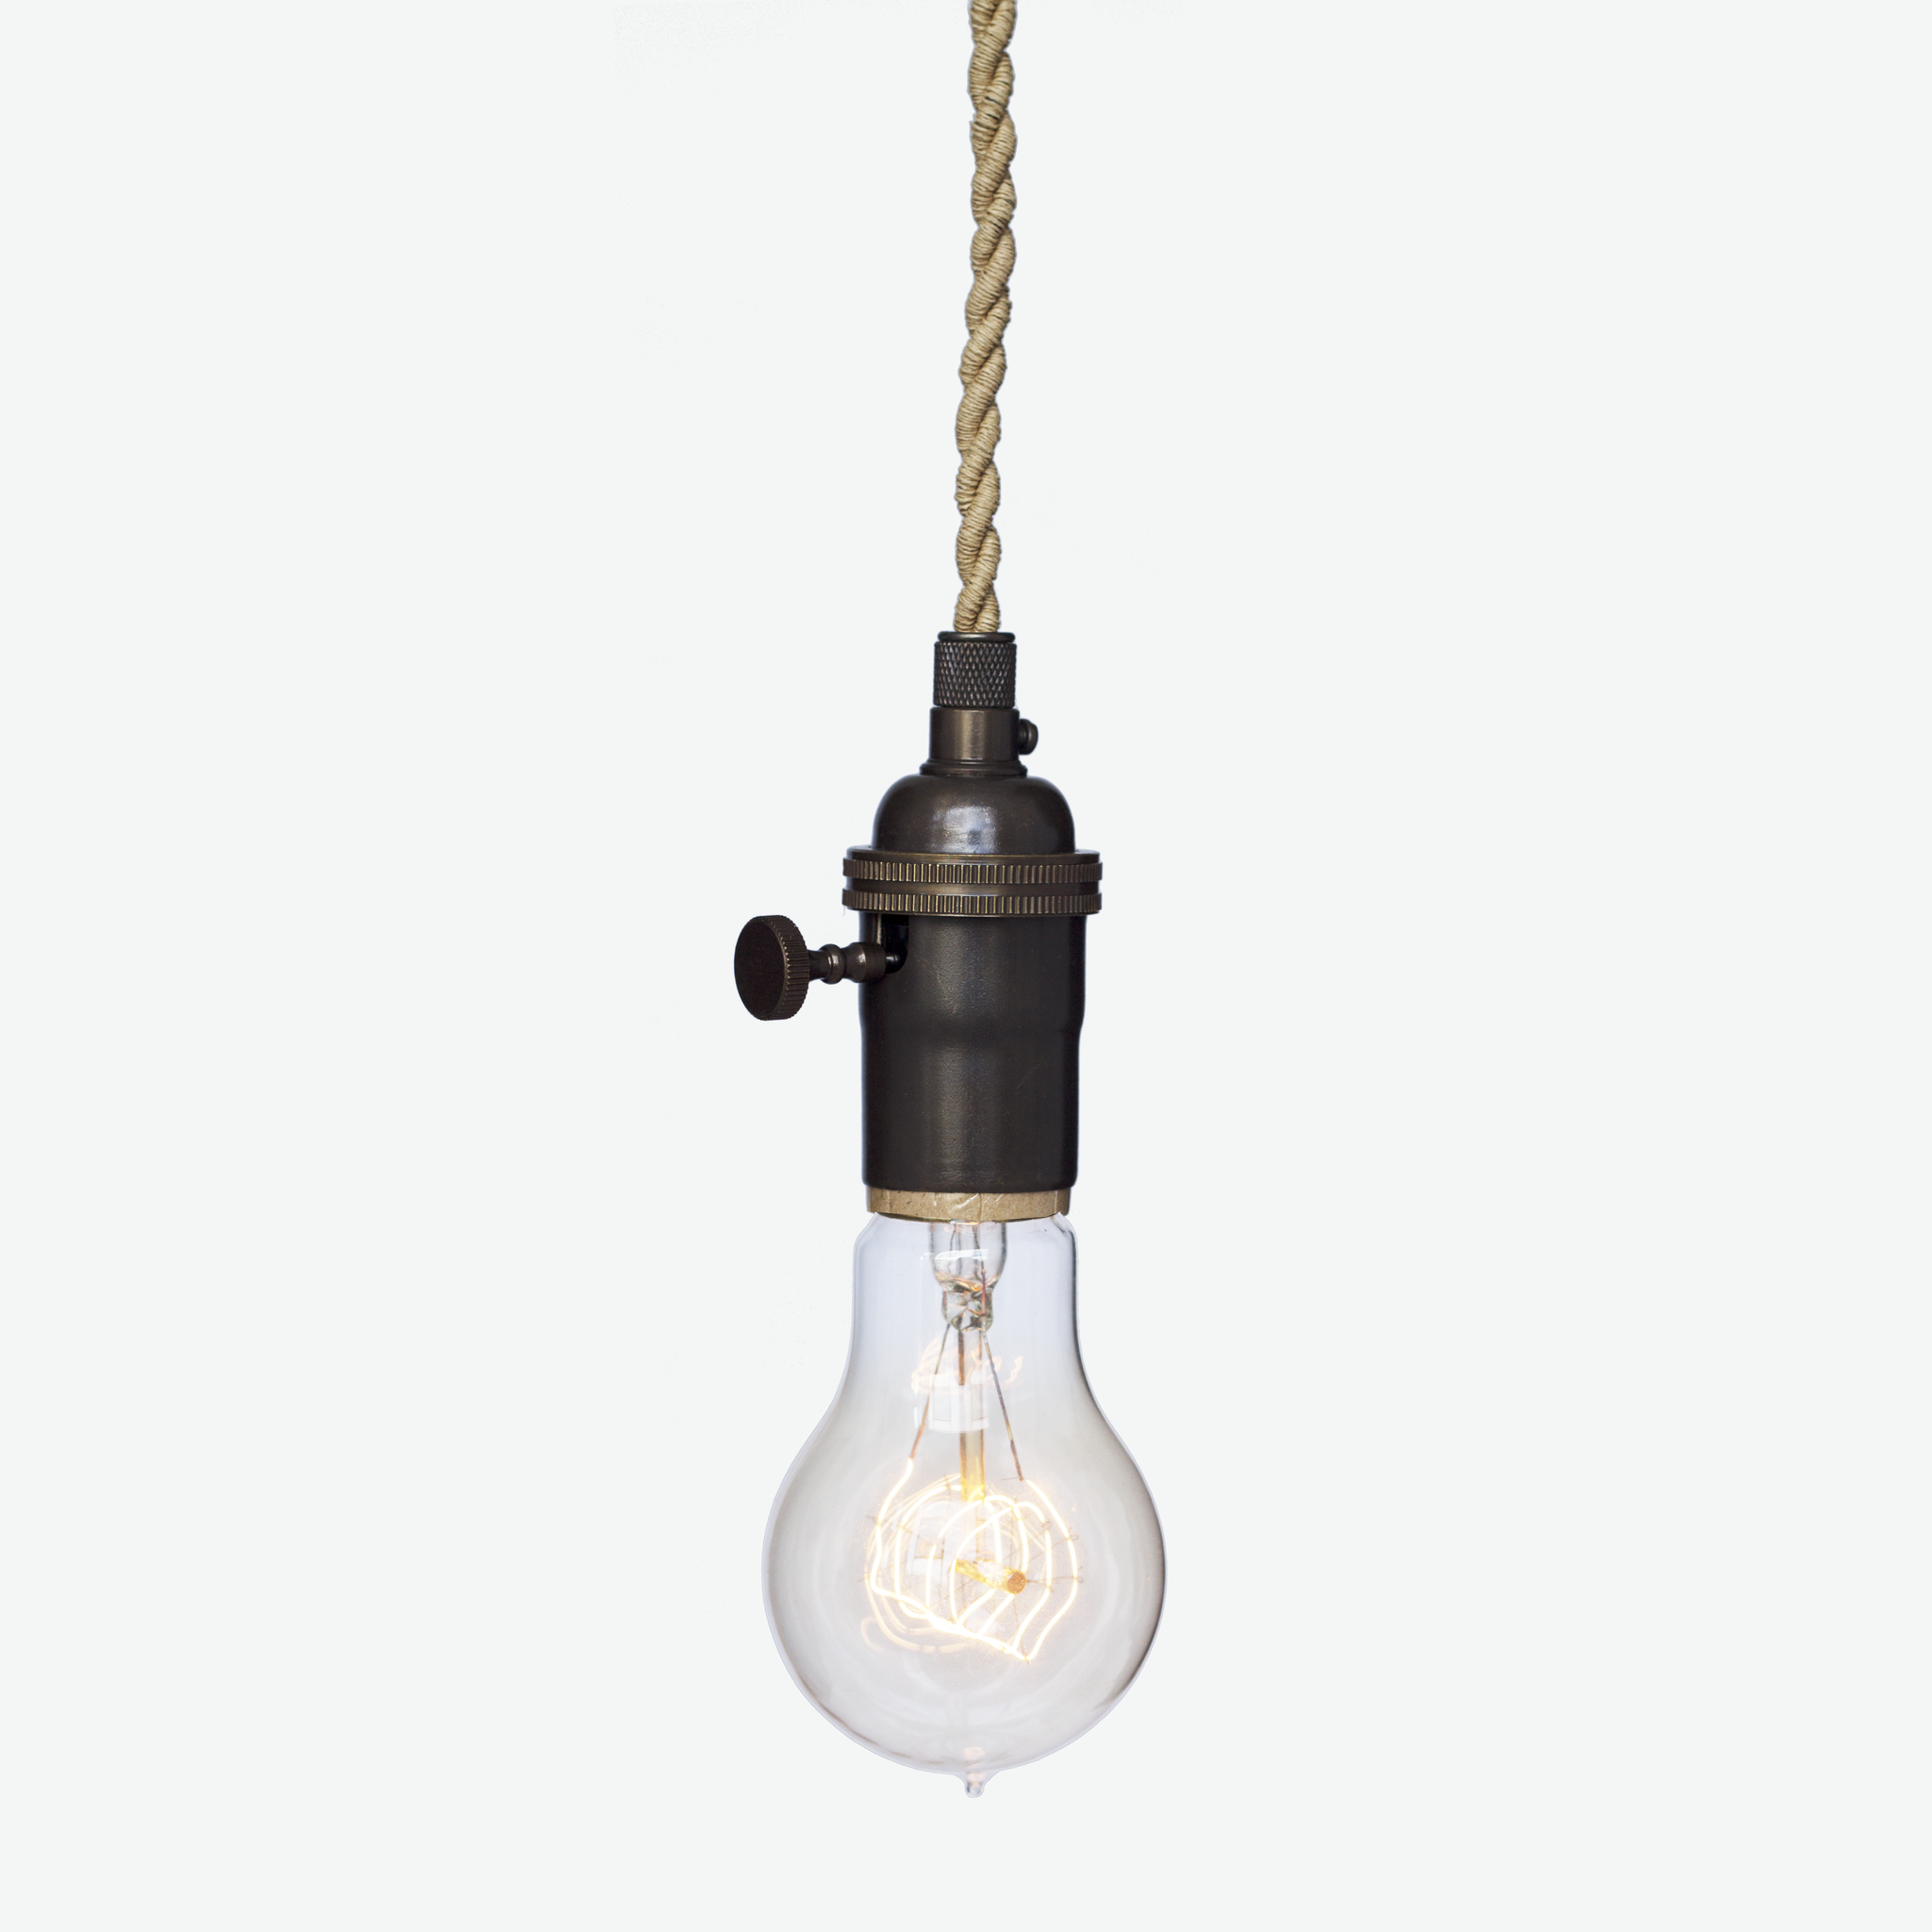 Nautical Ship Rope Cloth Cord Bronze Bare Bulb Pendant Light Hammers And Heels Bulb Pendant Light Bulb Pendant Light